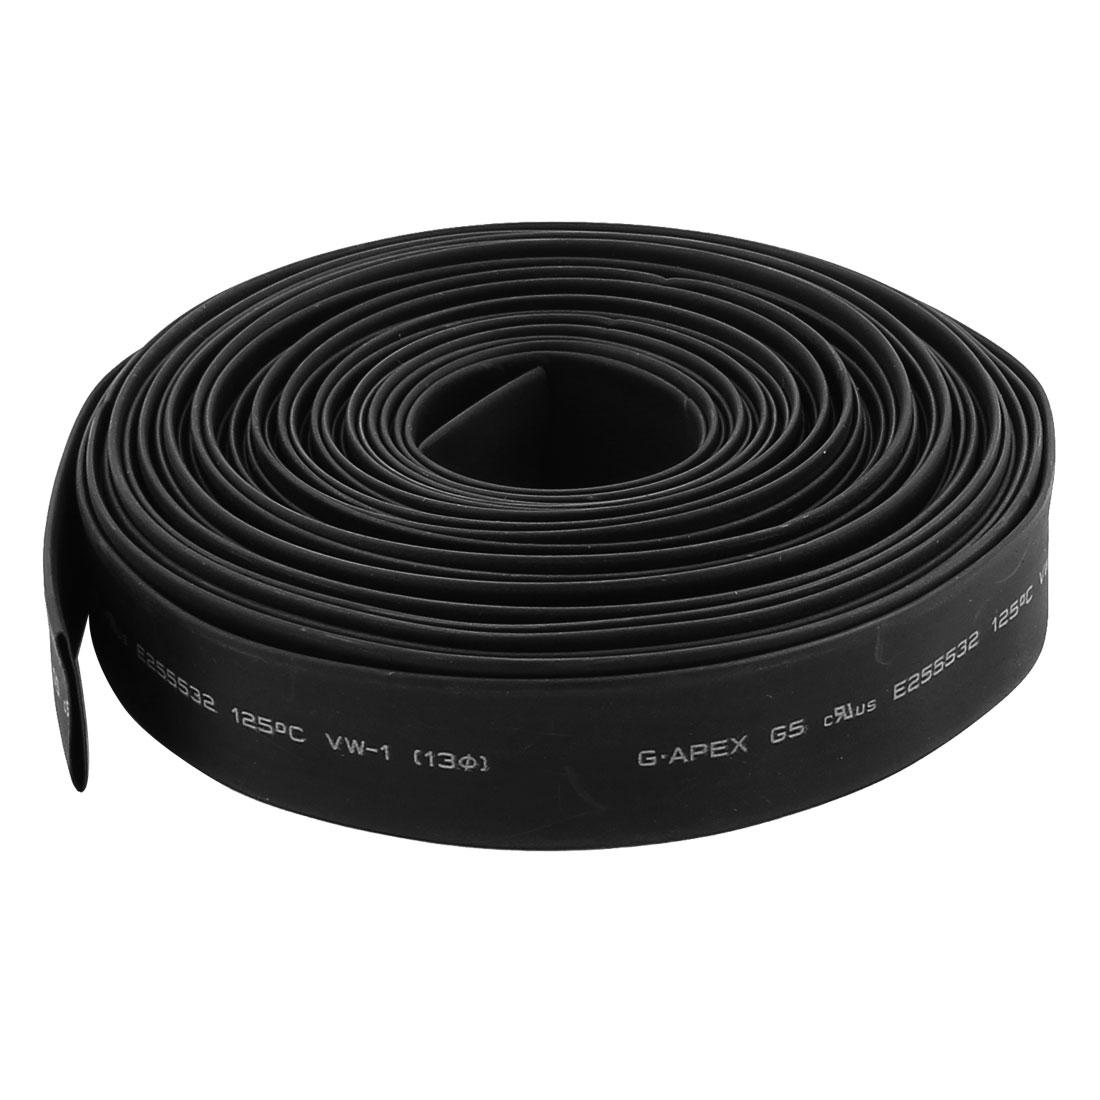 32.8ft x 13mm Diameter 2:1 Shrinkage Ratio PE Insulated Heat Shrink Tubing Black